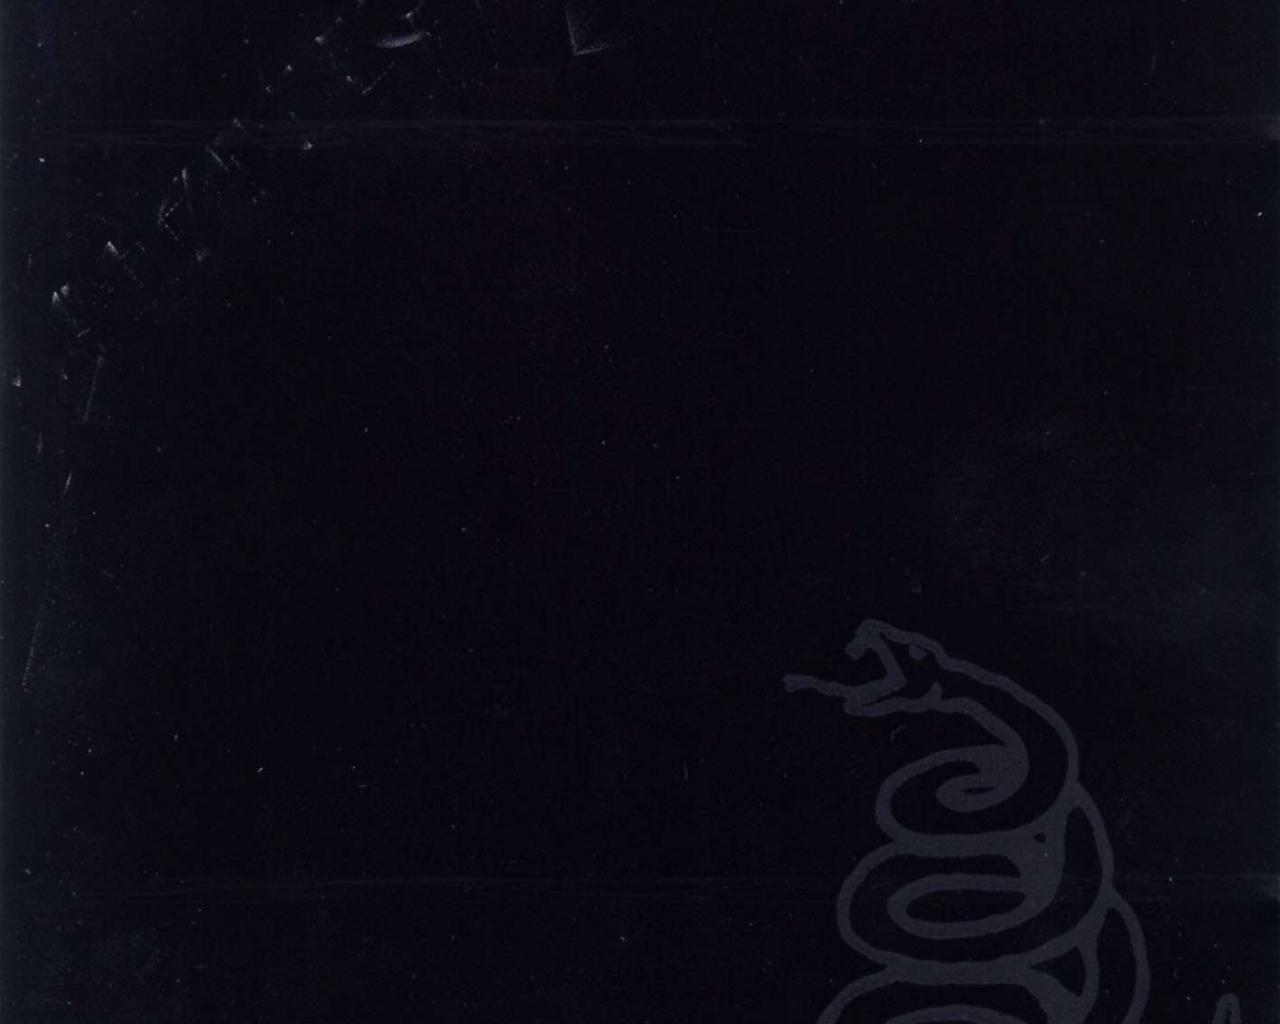 Metallica Wallpaper Black Album Posted By Michelle Thompson